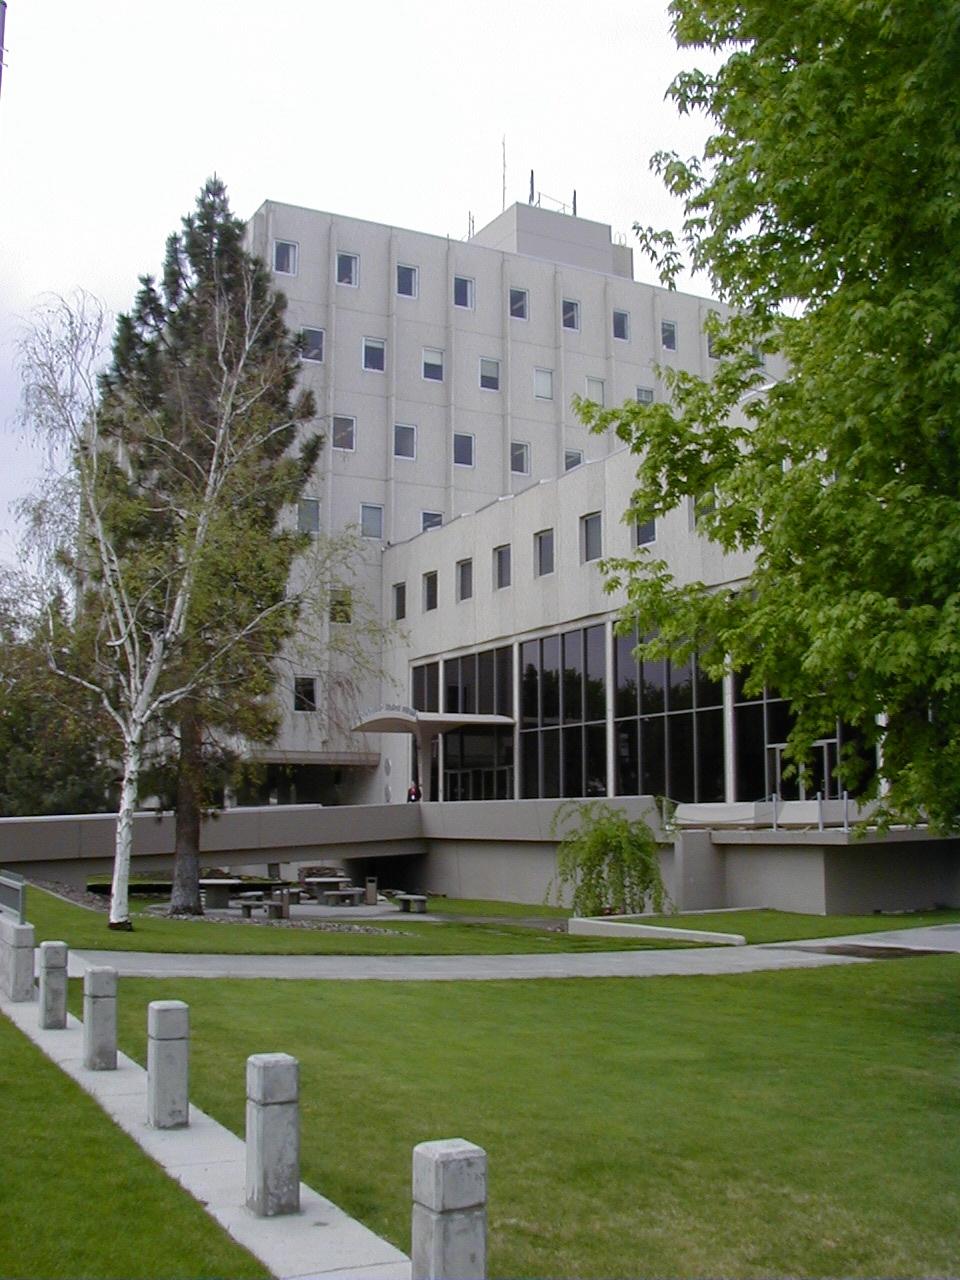 Richland Federal Building